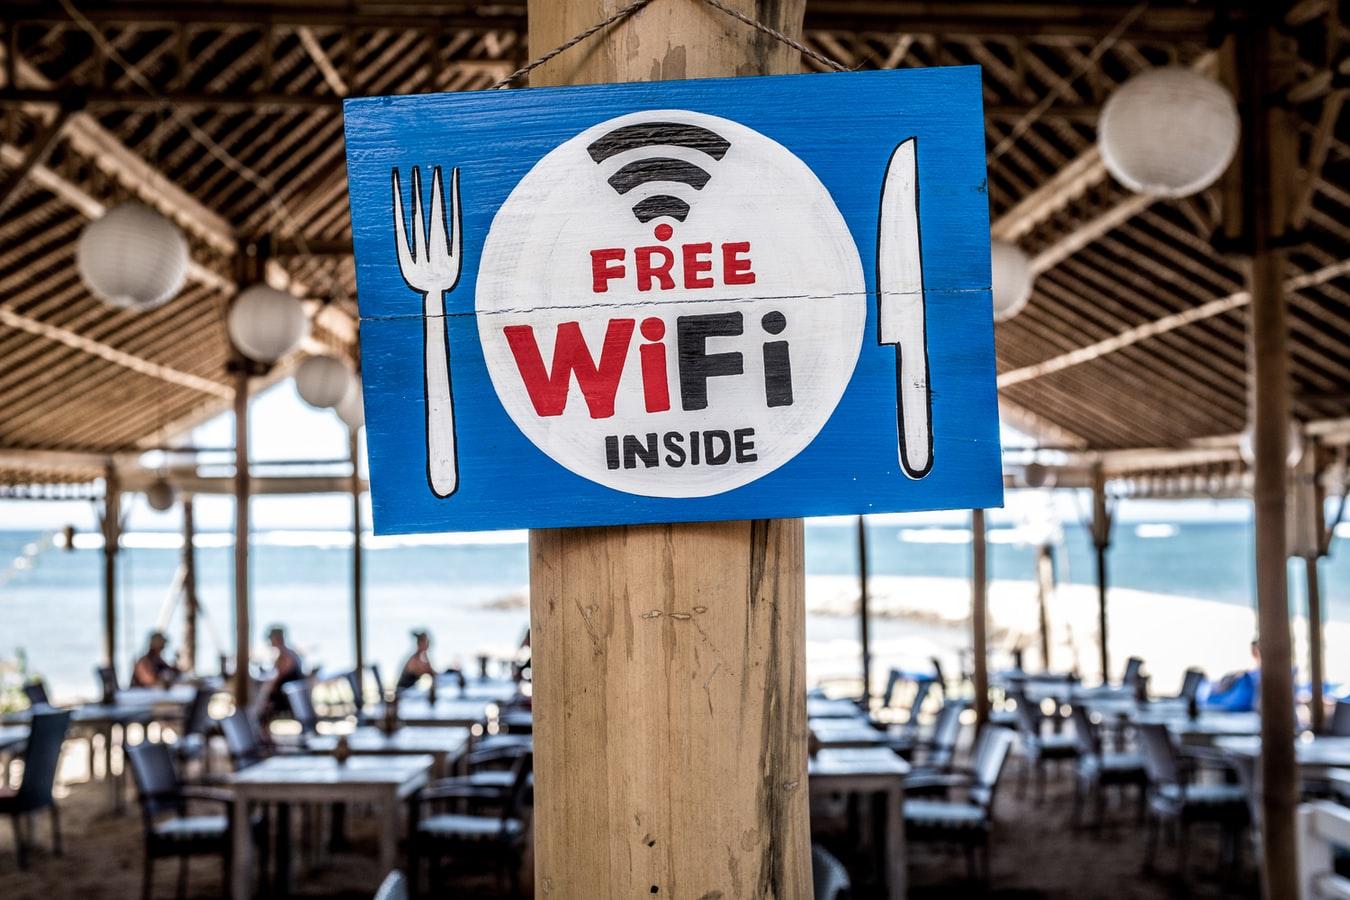 Wi-FI στο σπίτι. Είμαστε προστατευμένοι; Τι να προσέξουμε